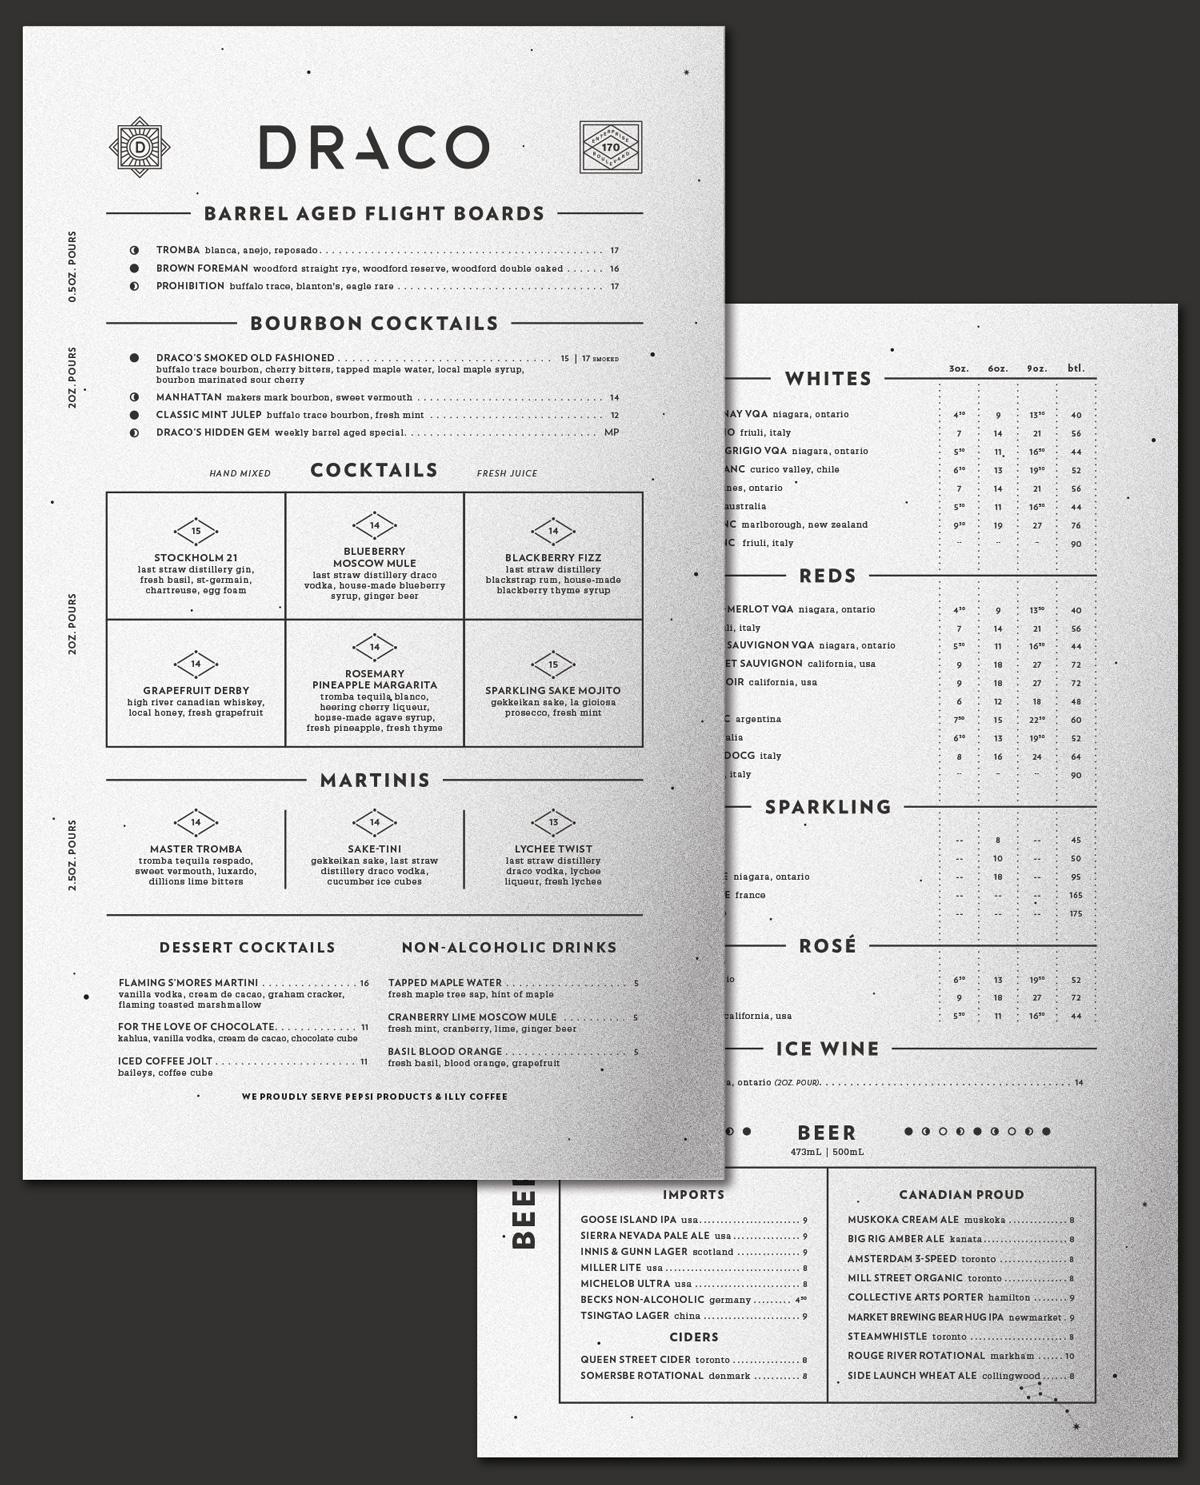 draco_drinks_01